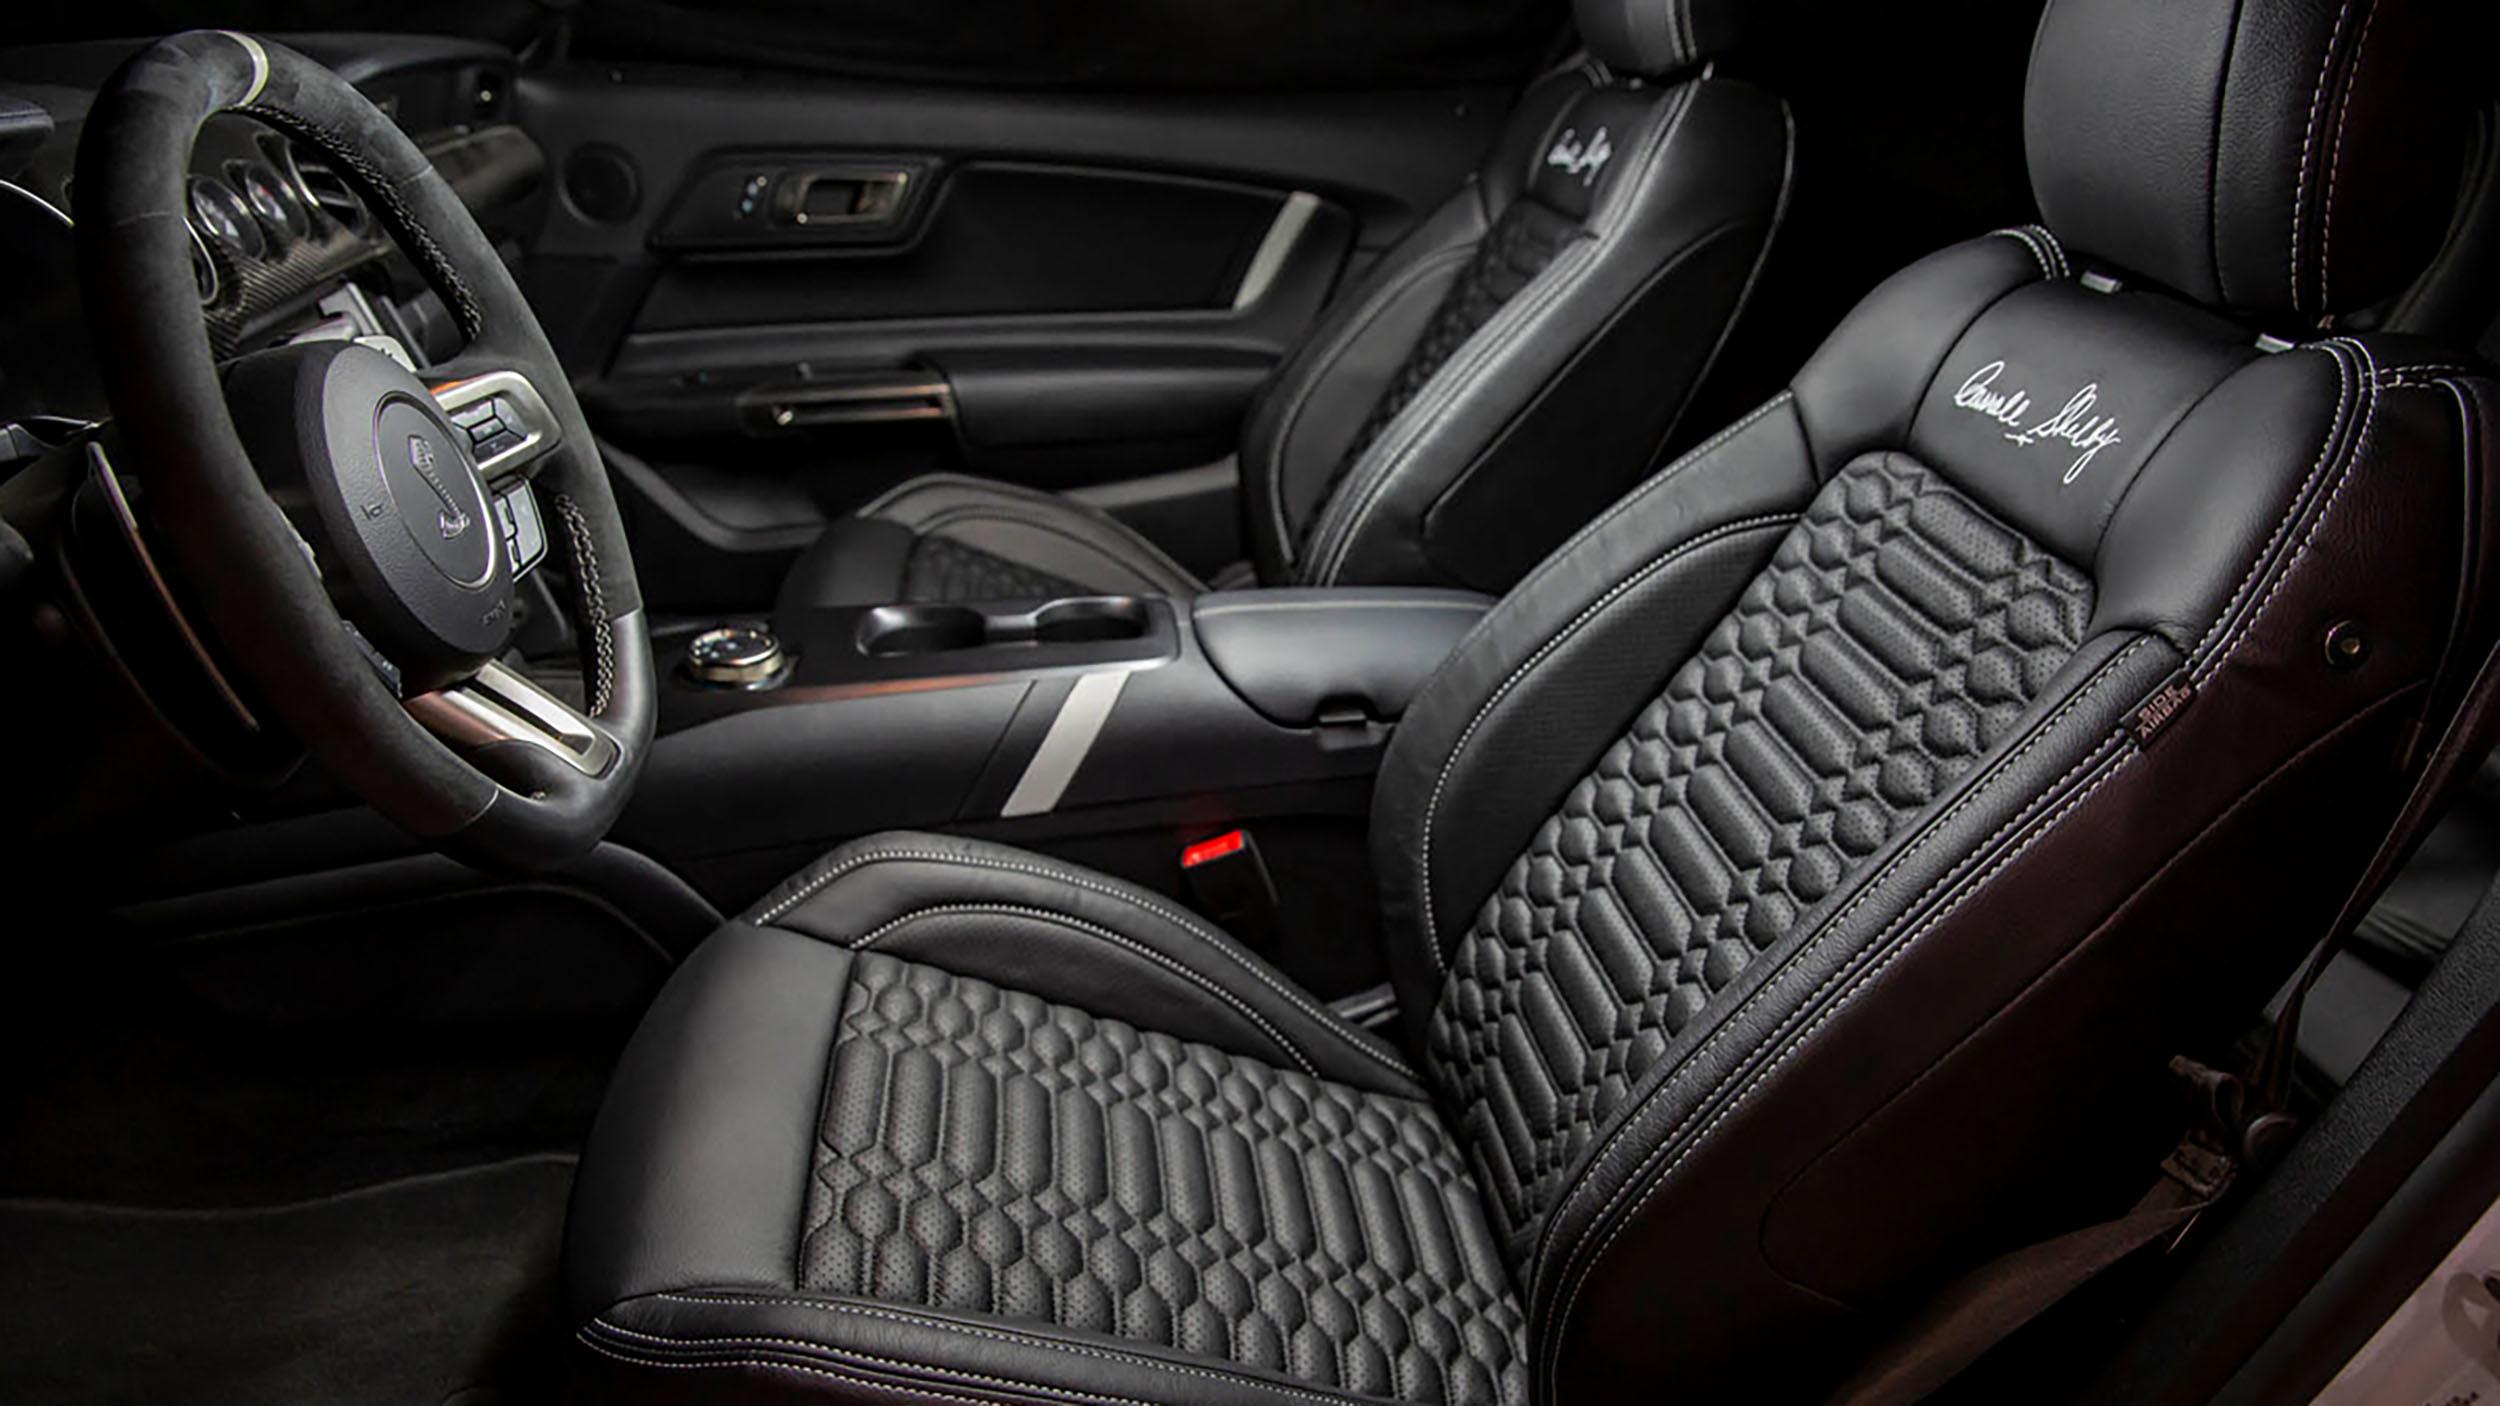 2021 Shelby GT500 interior